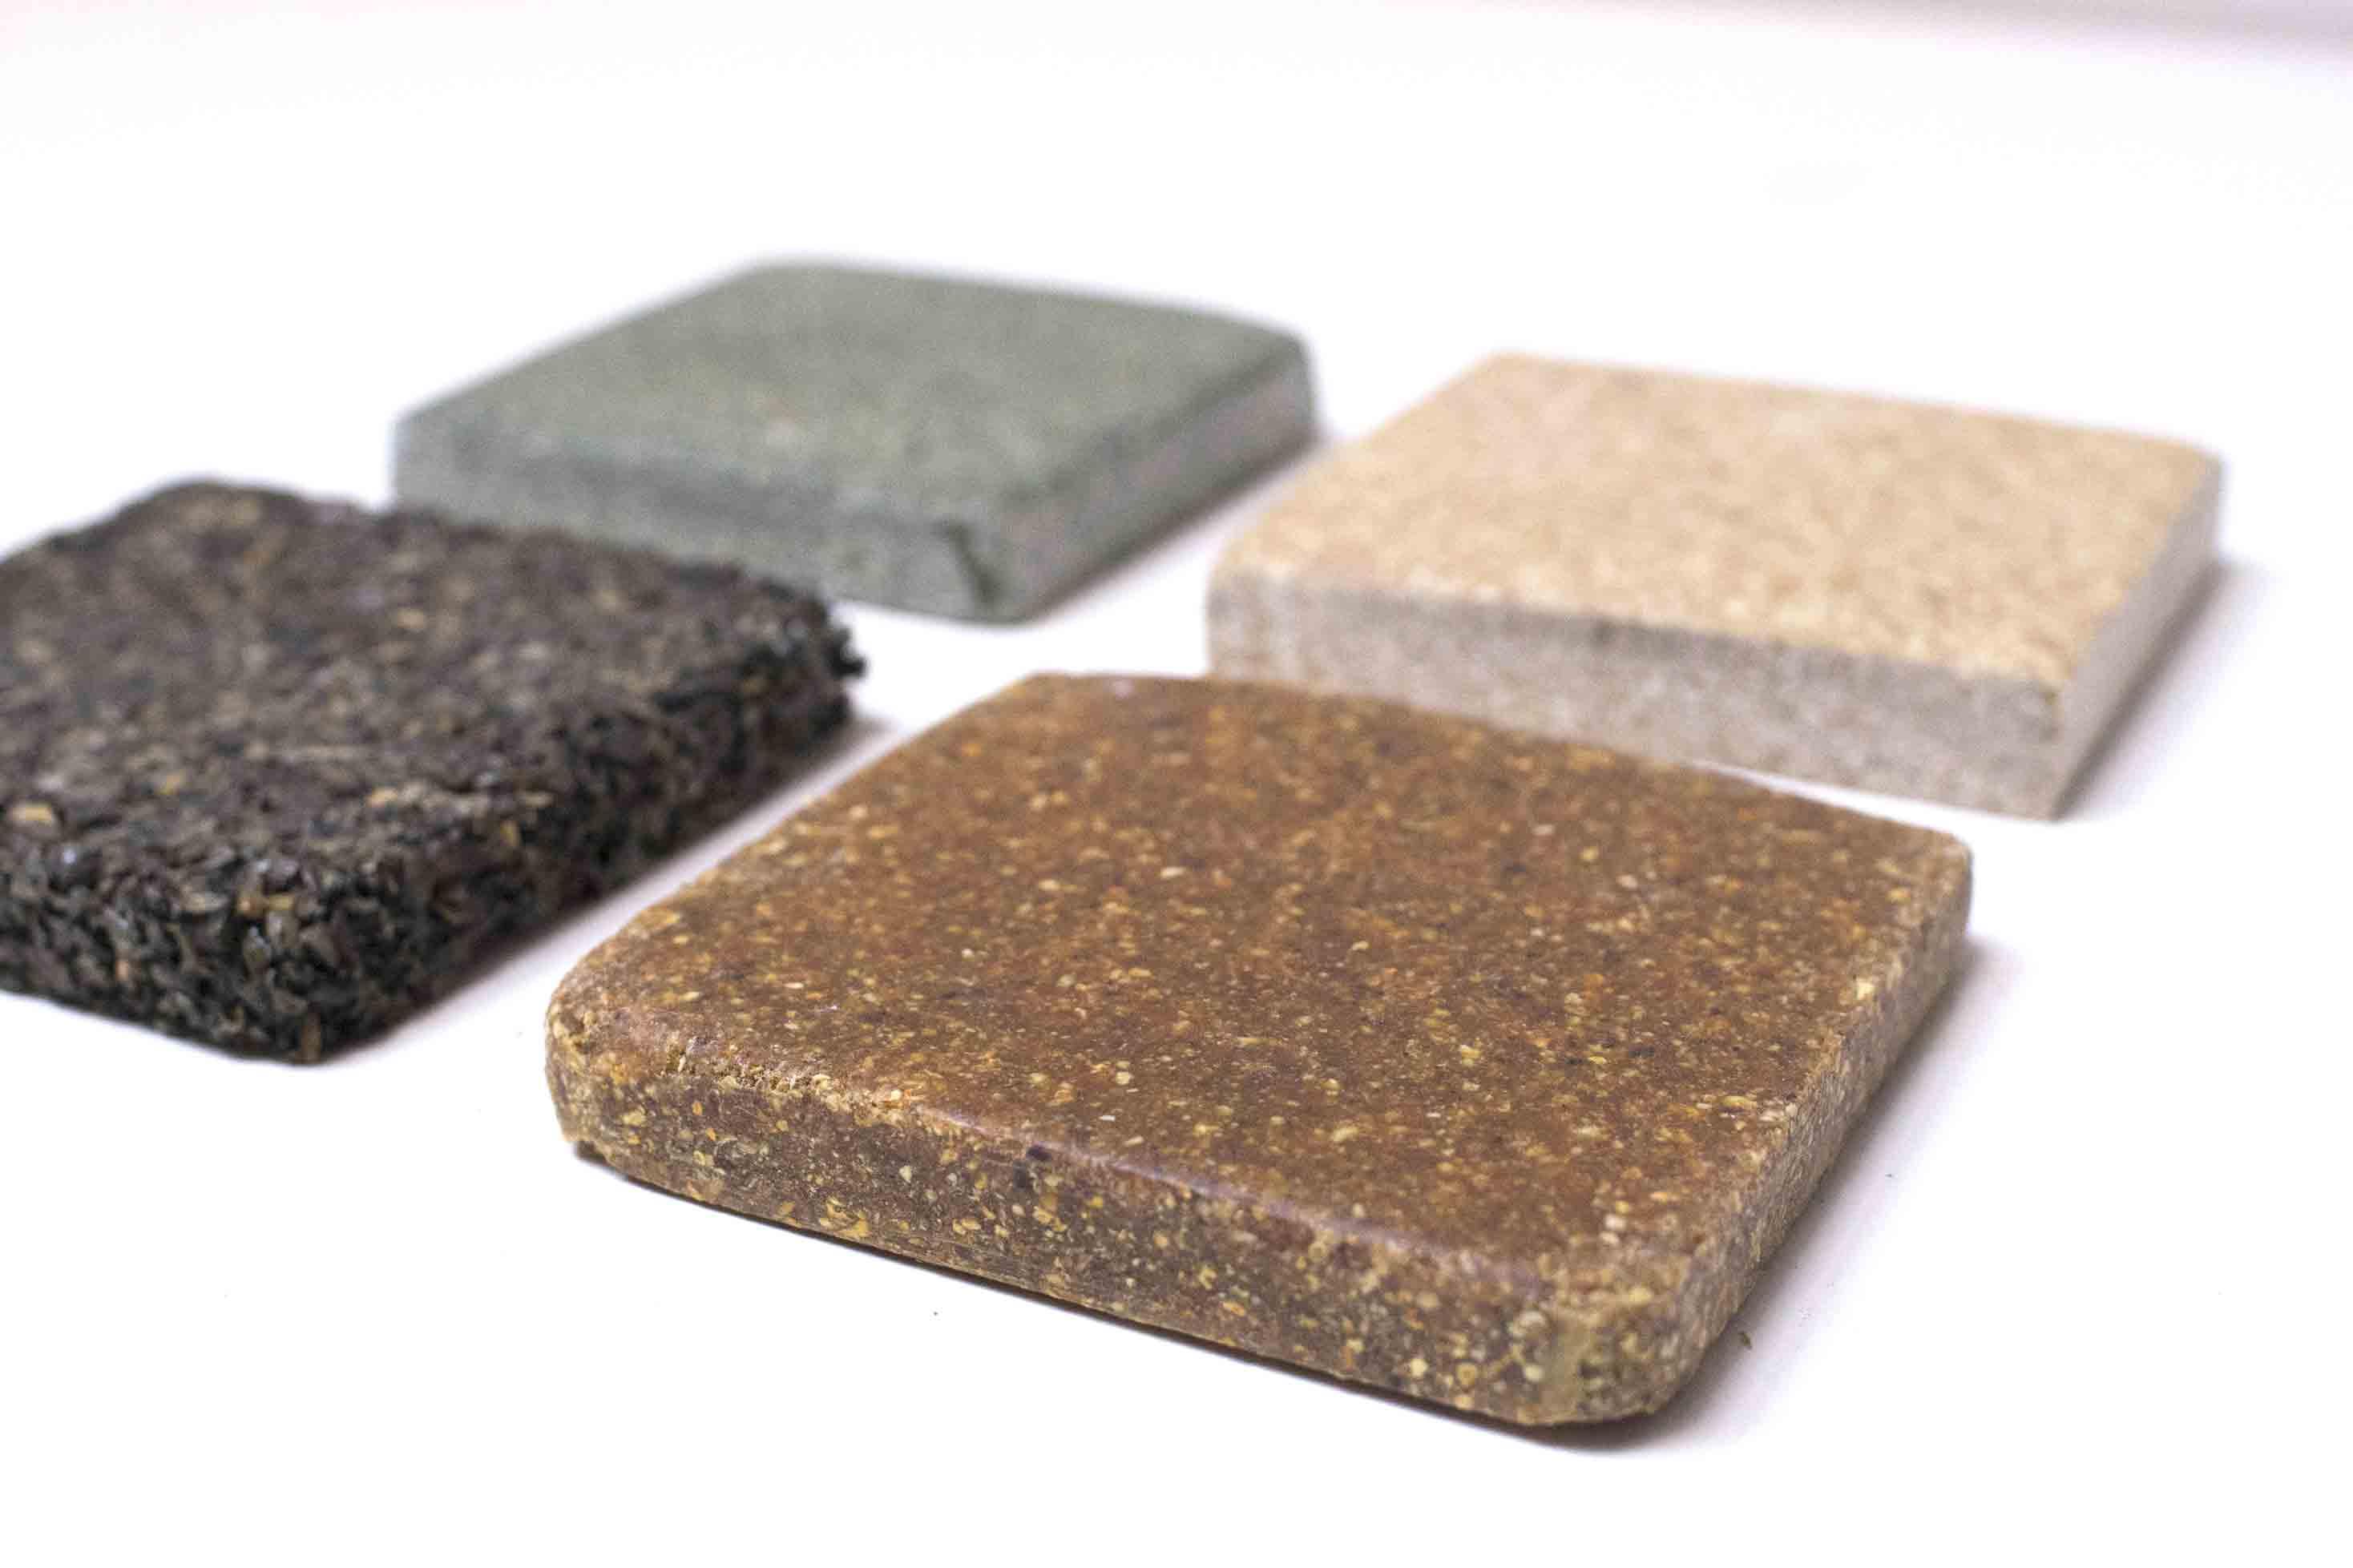 Taller de biocomposite